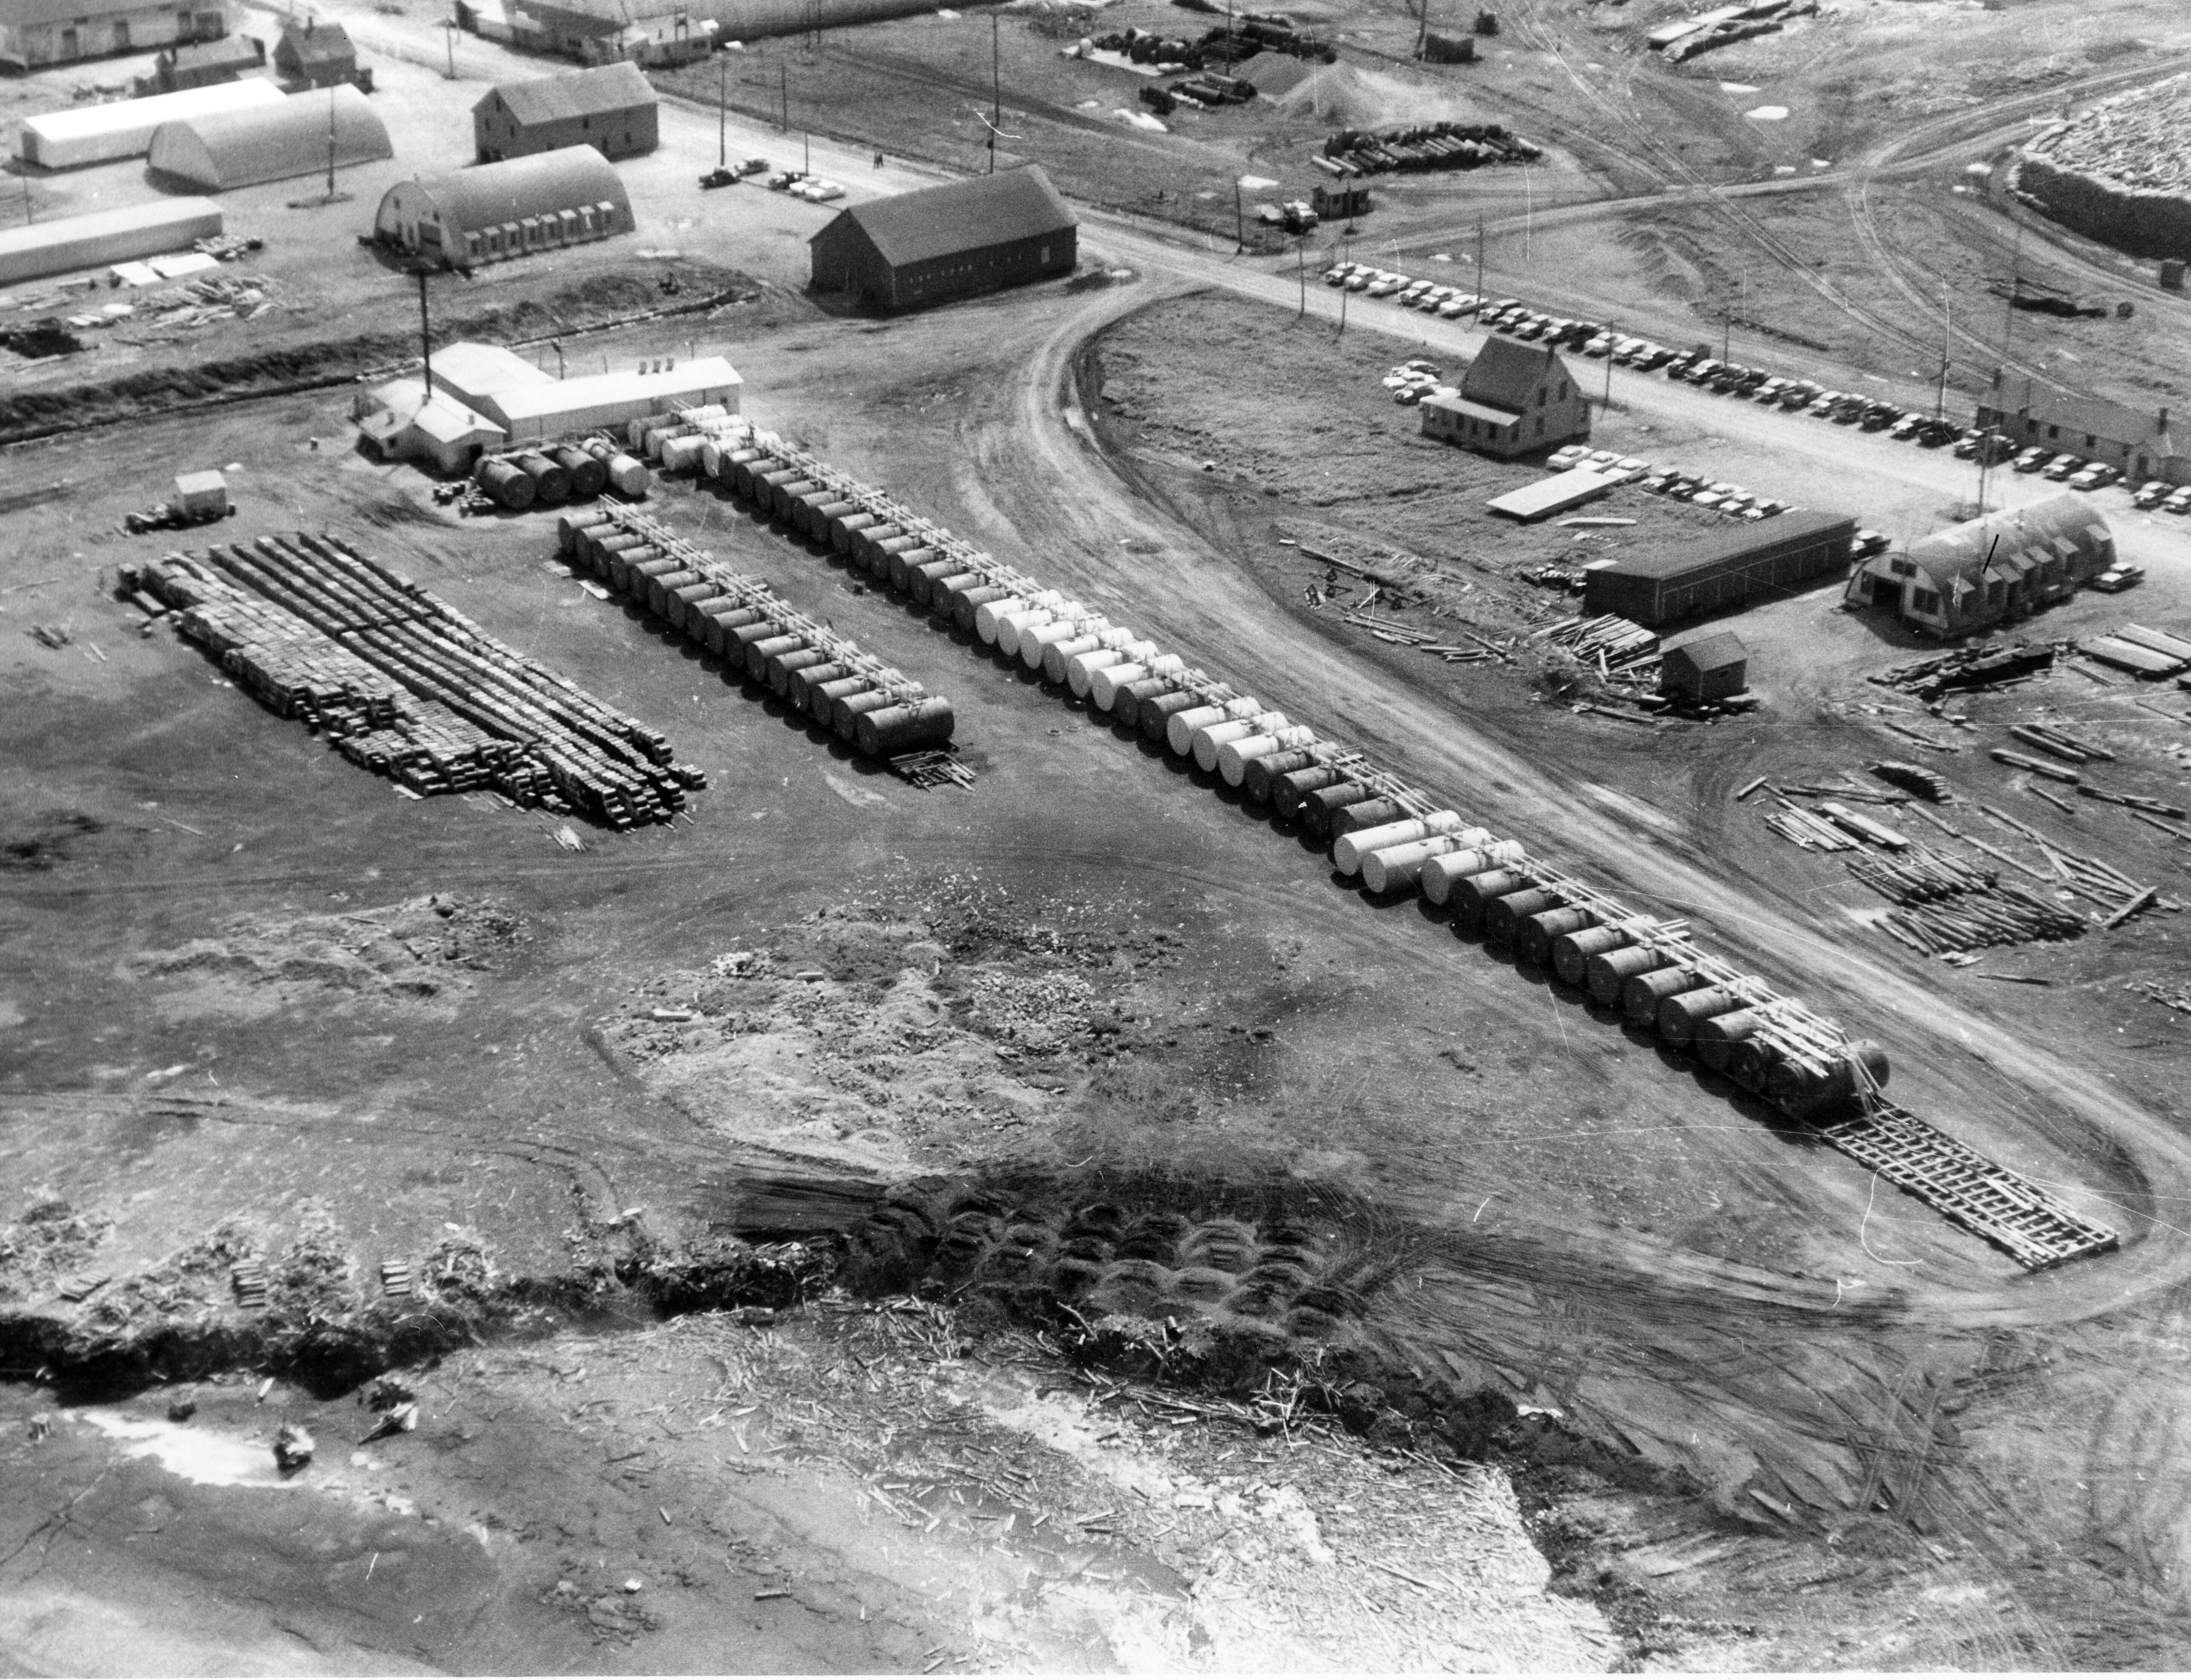 Dalhousie - DDT mixing plant_1957-58_Hi-29-1